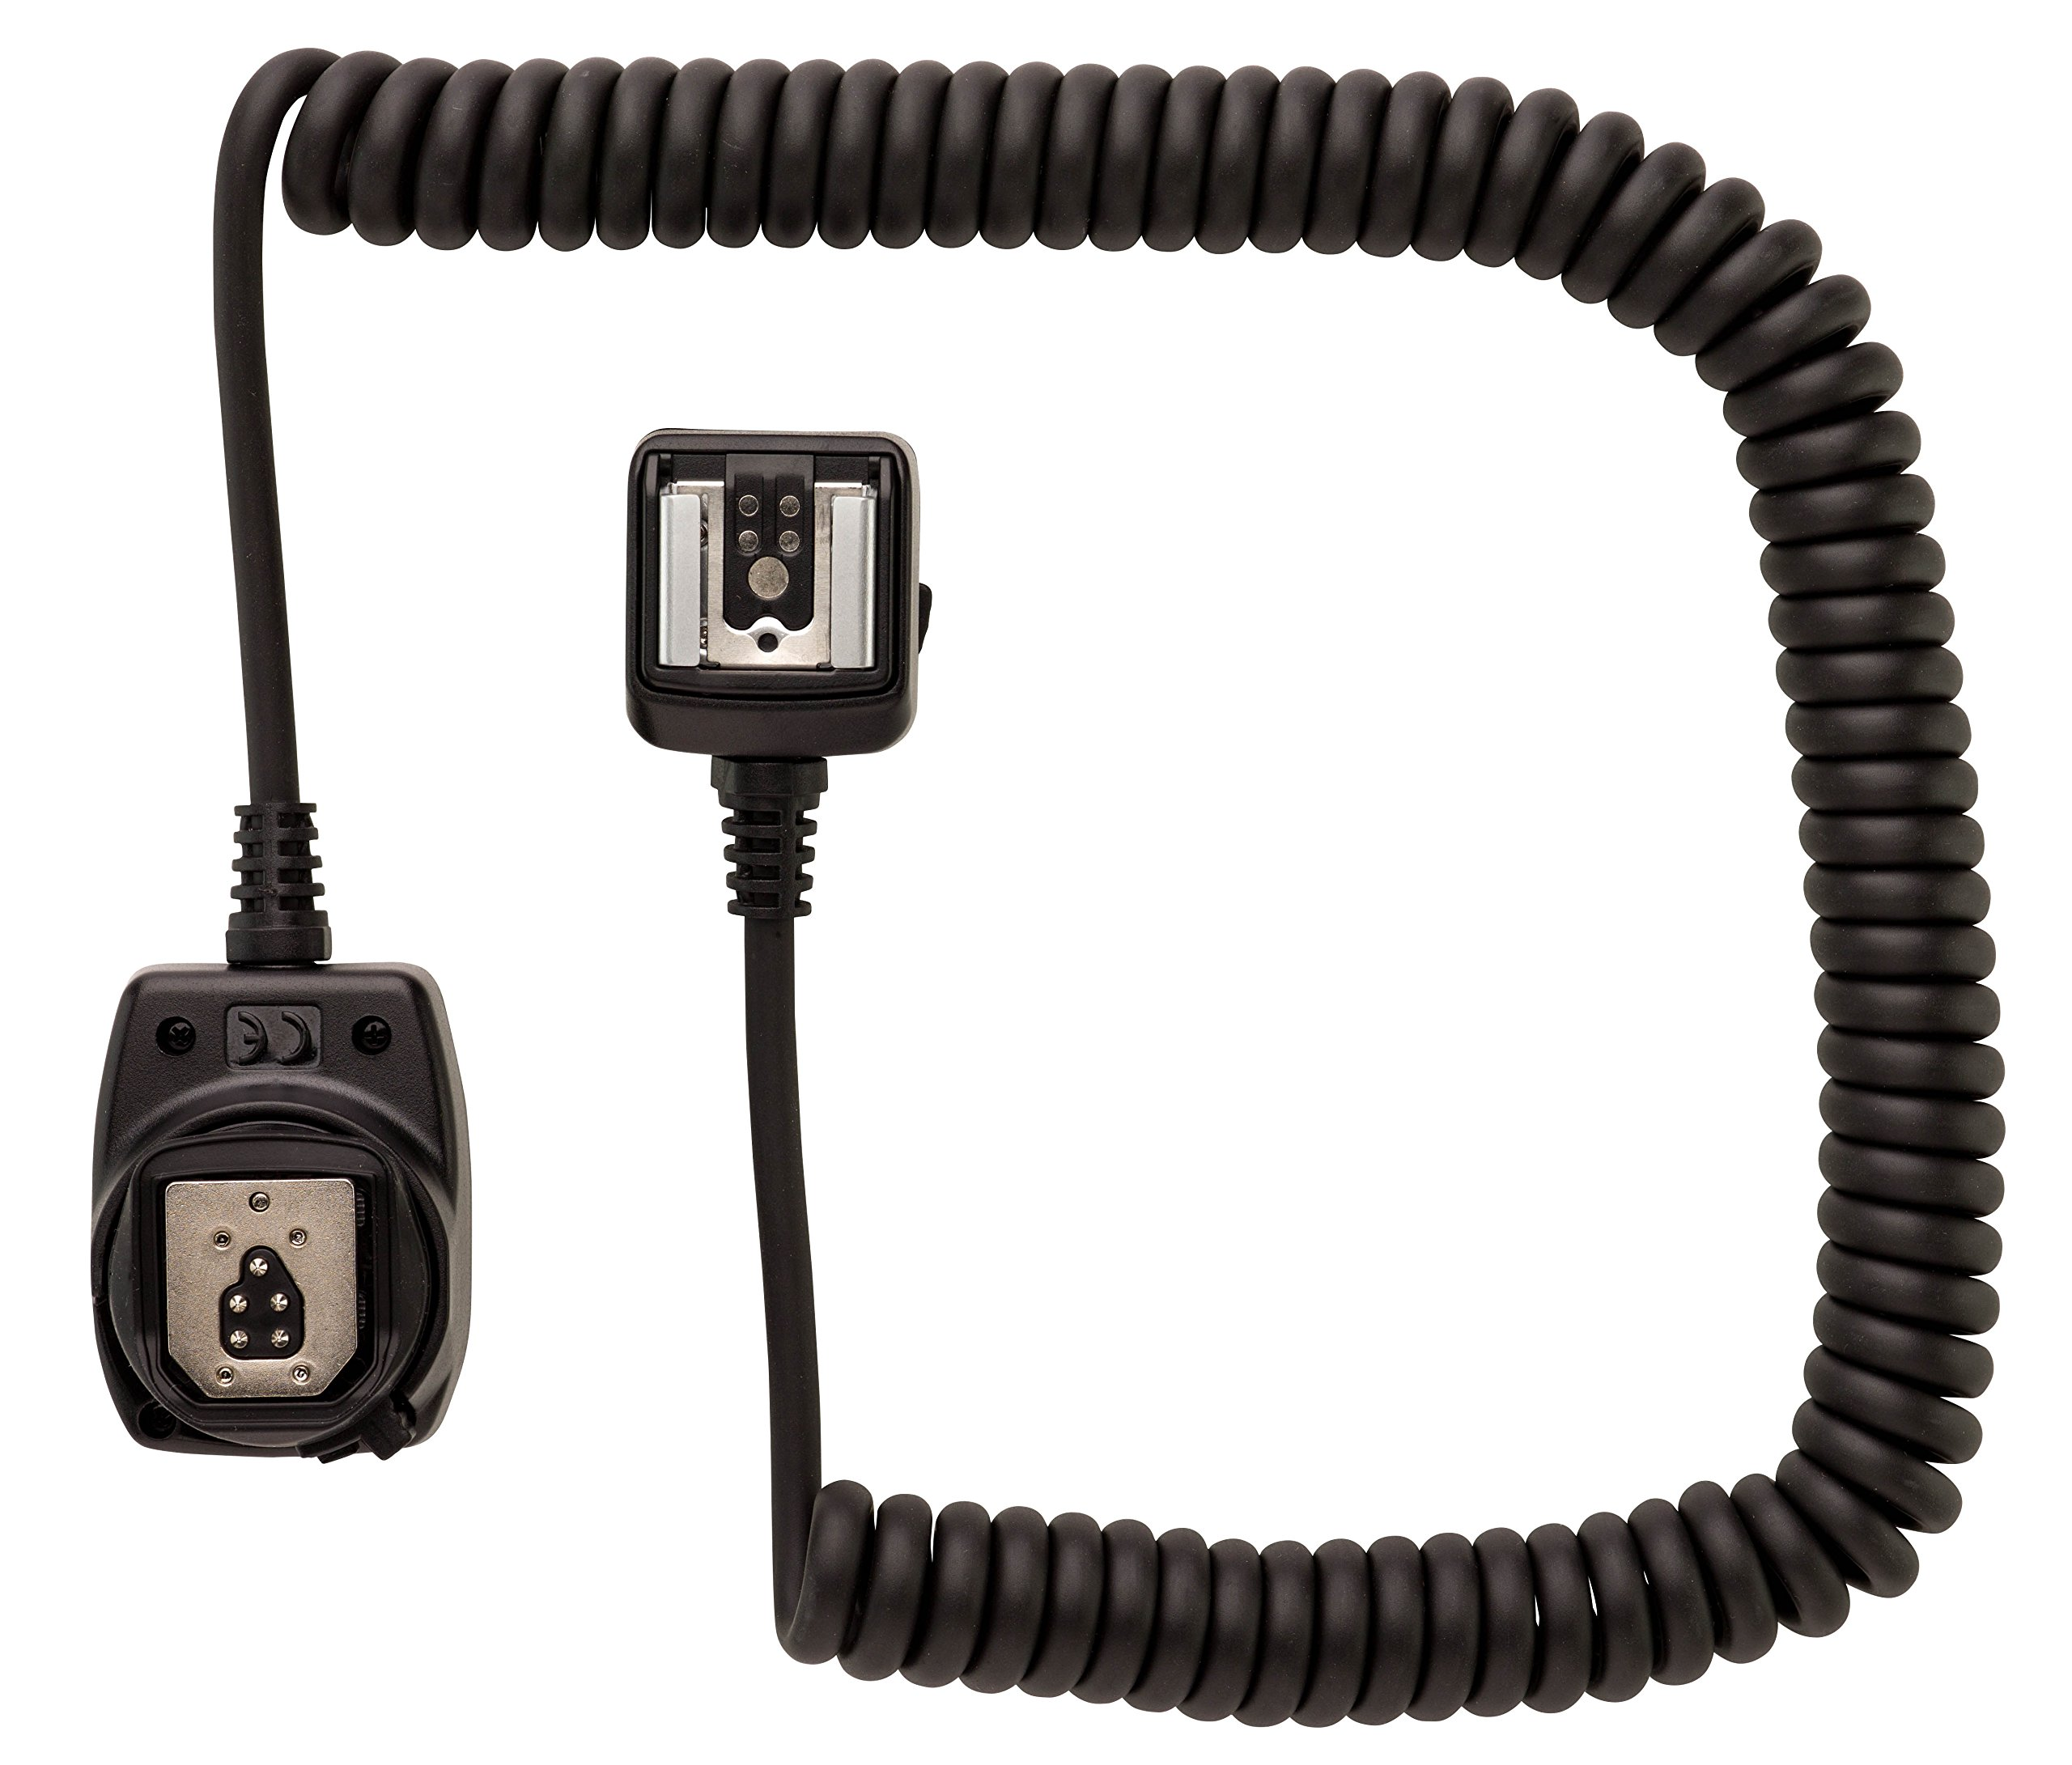 Phottix TTL Flash Remote Cord for Canon OC-E3 (PH38330) by Phottix